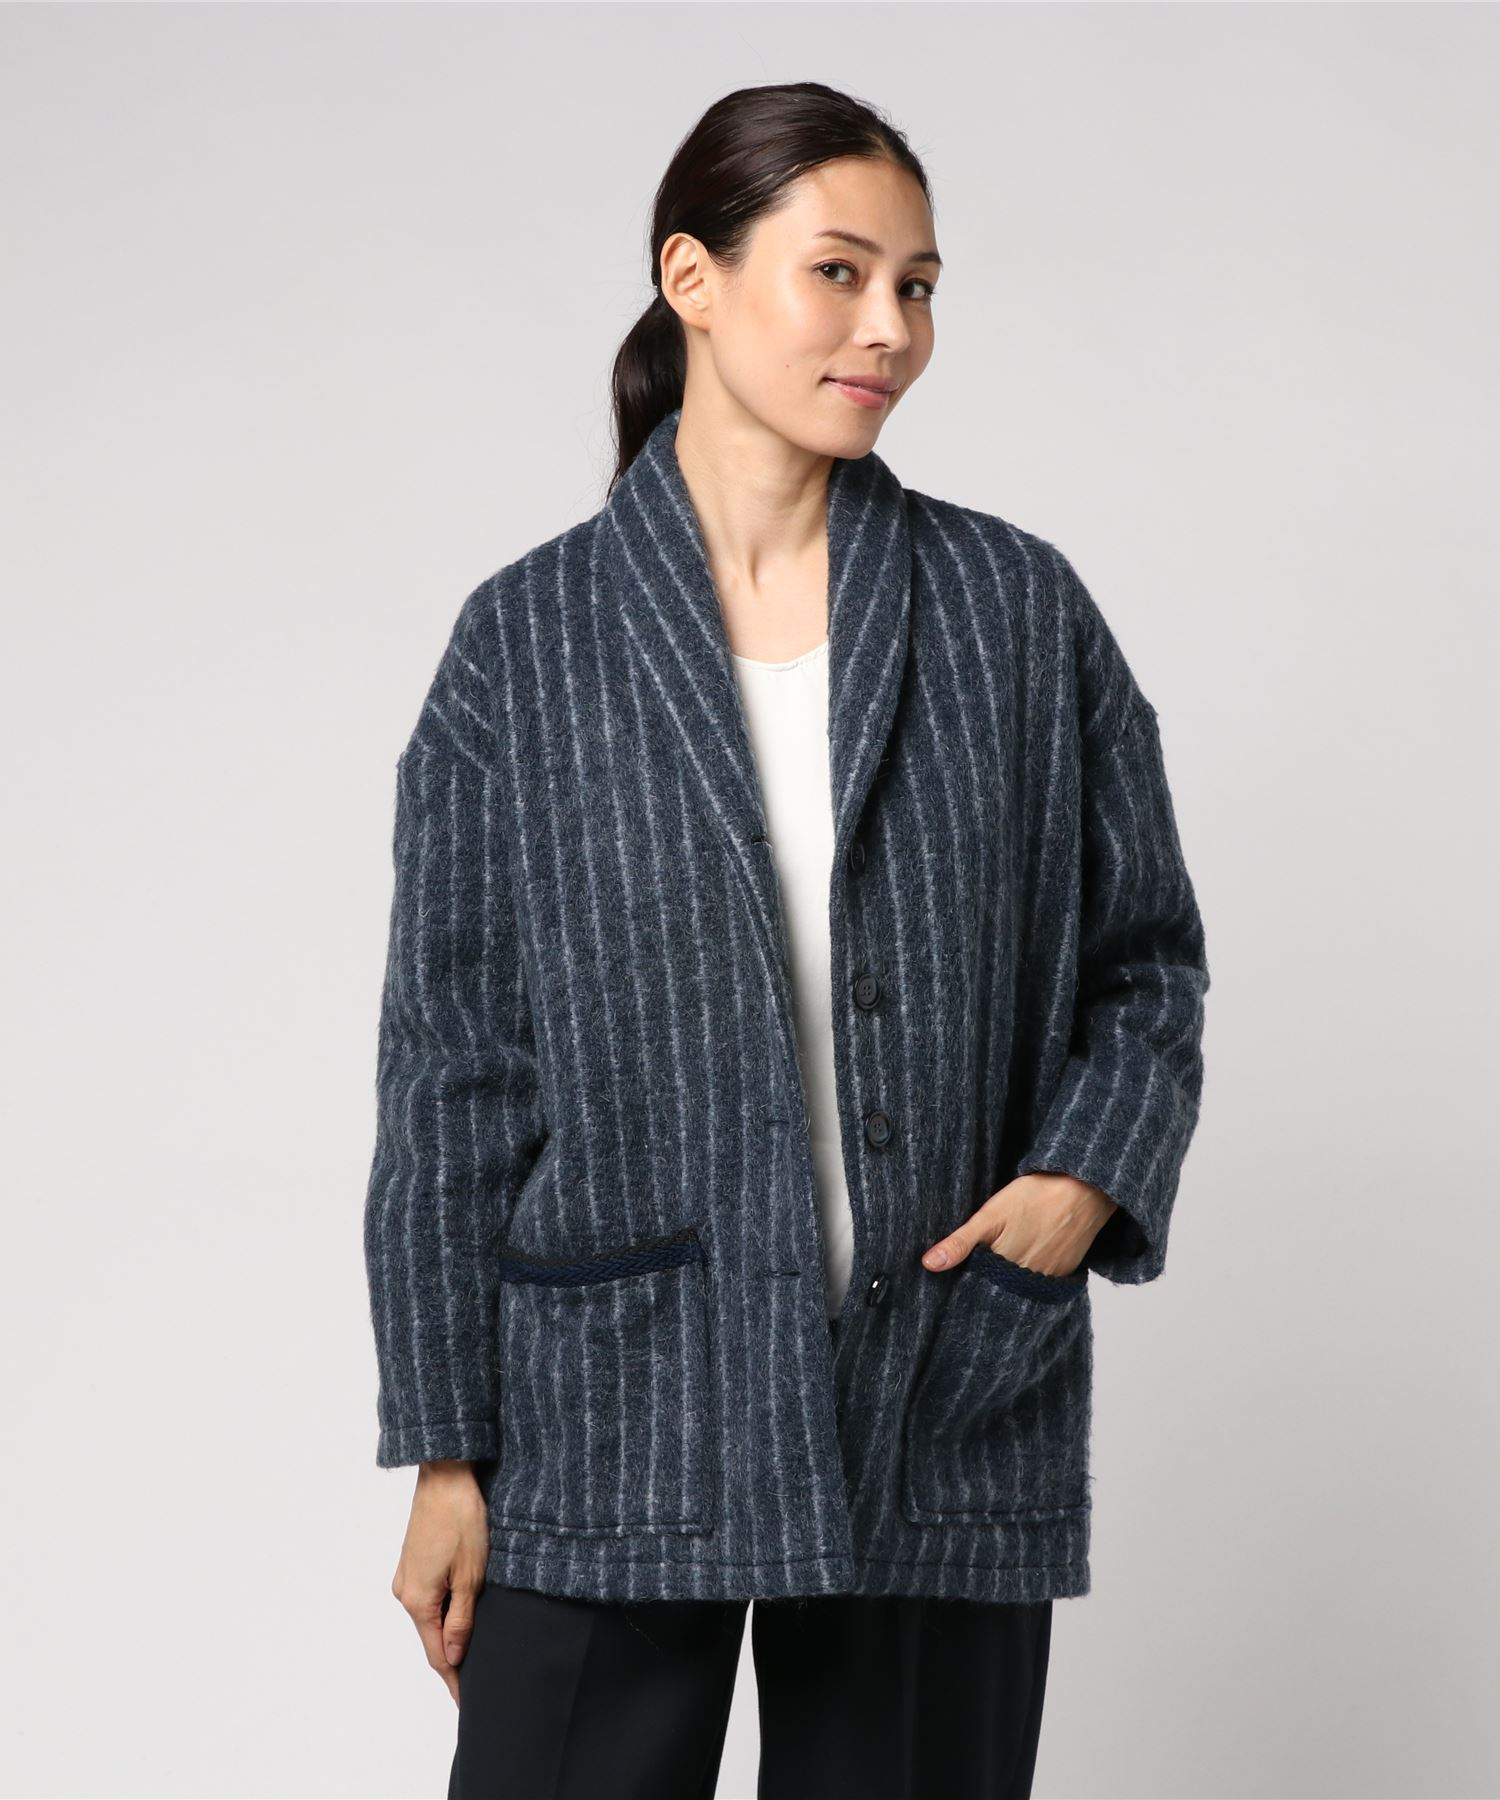 SUZIE WINKLE ストライプウールジャケット